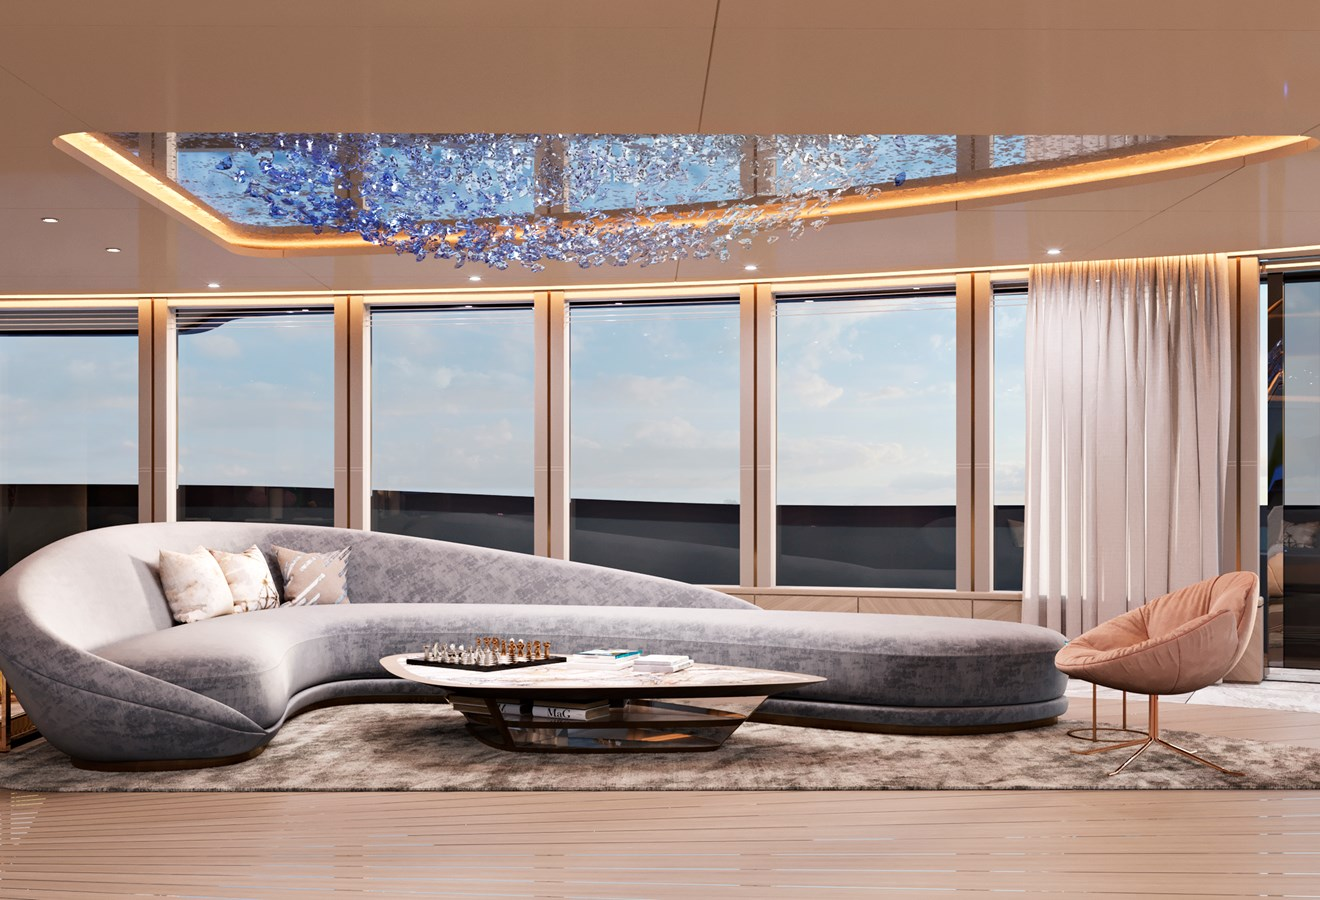 BEYOND 82M interiors- Fotiadis Design (6) 2023 CUSTOM BUILT BEYOND 82 Mega Yacht 2442975